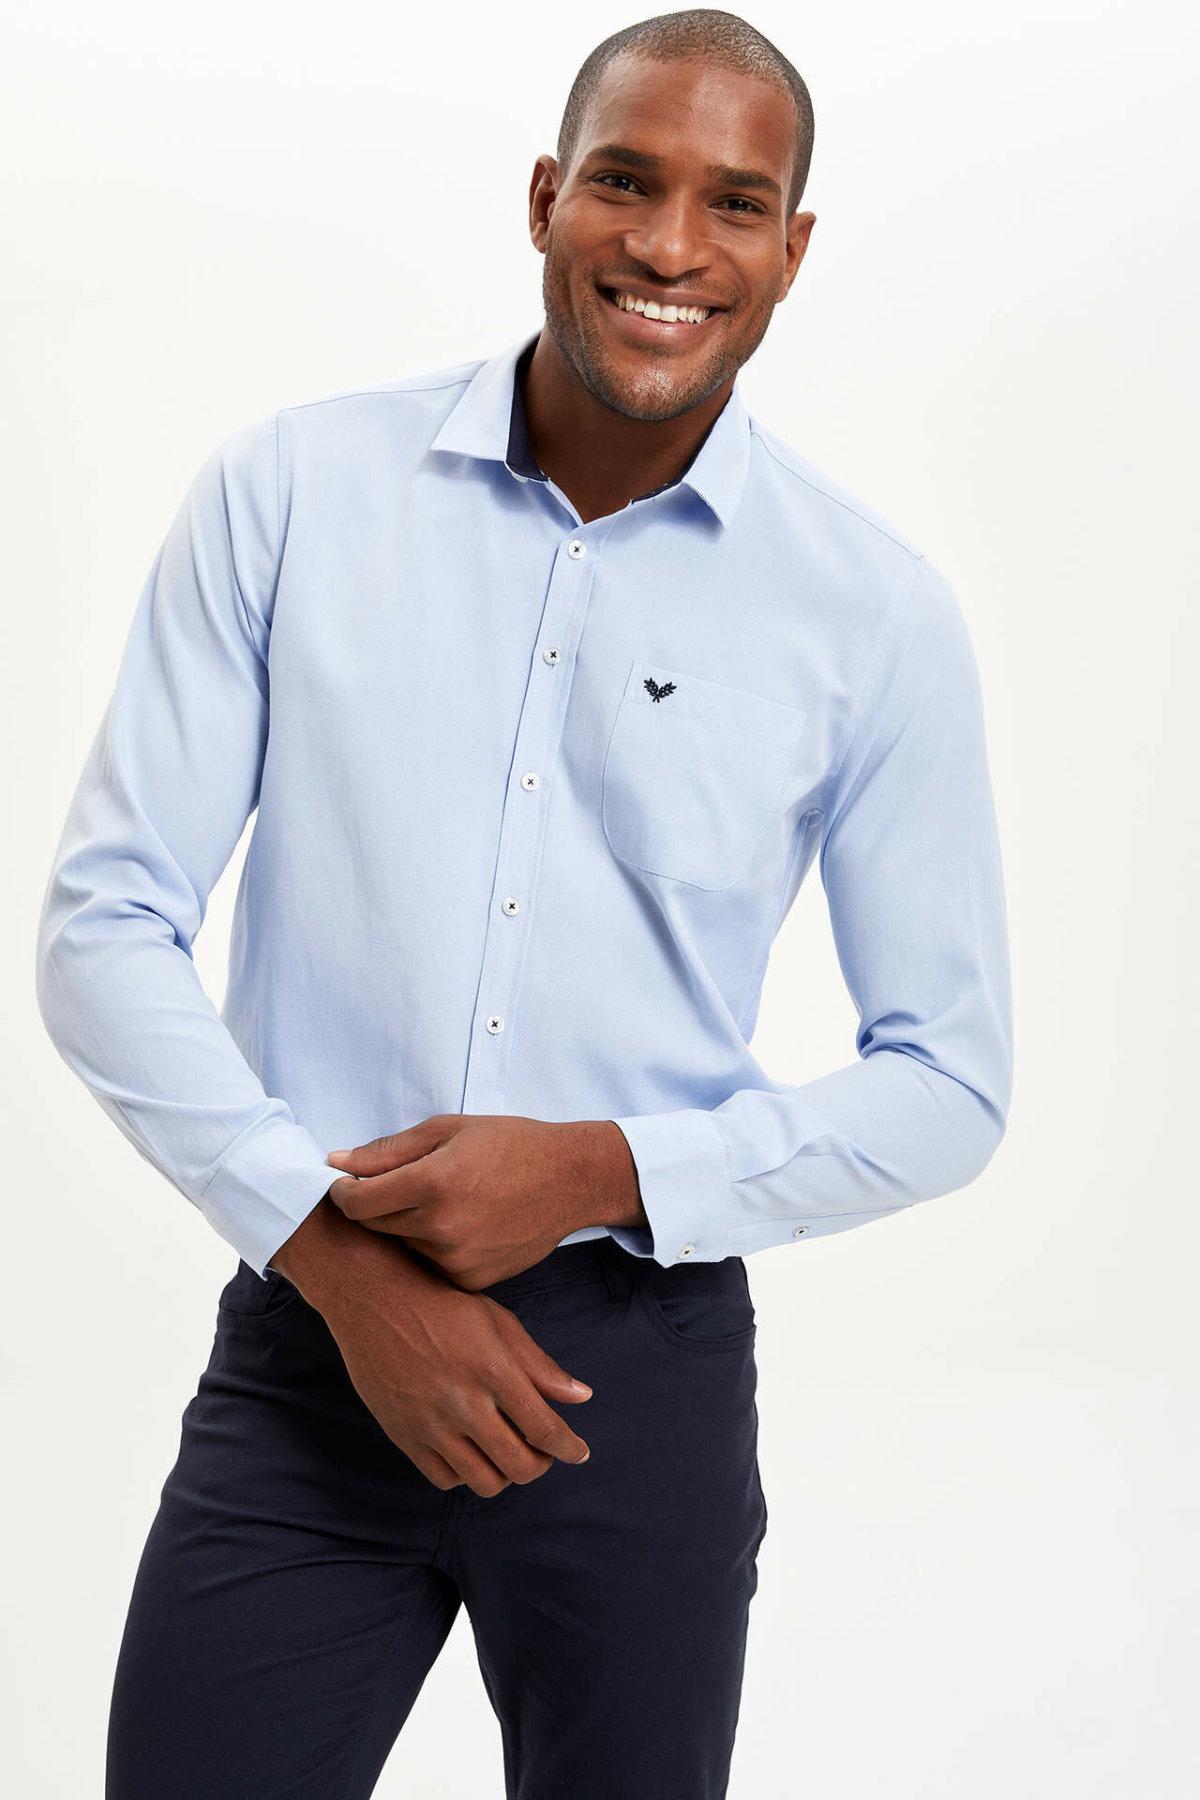 DeFacto Men Formal Solid Shirt Casual Woven Top Long Sleeve Shirt Office Business Wear Top Shirt New - L0671AZ19AU